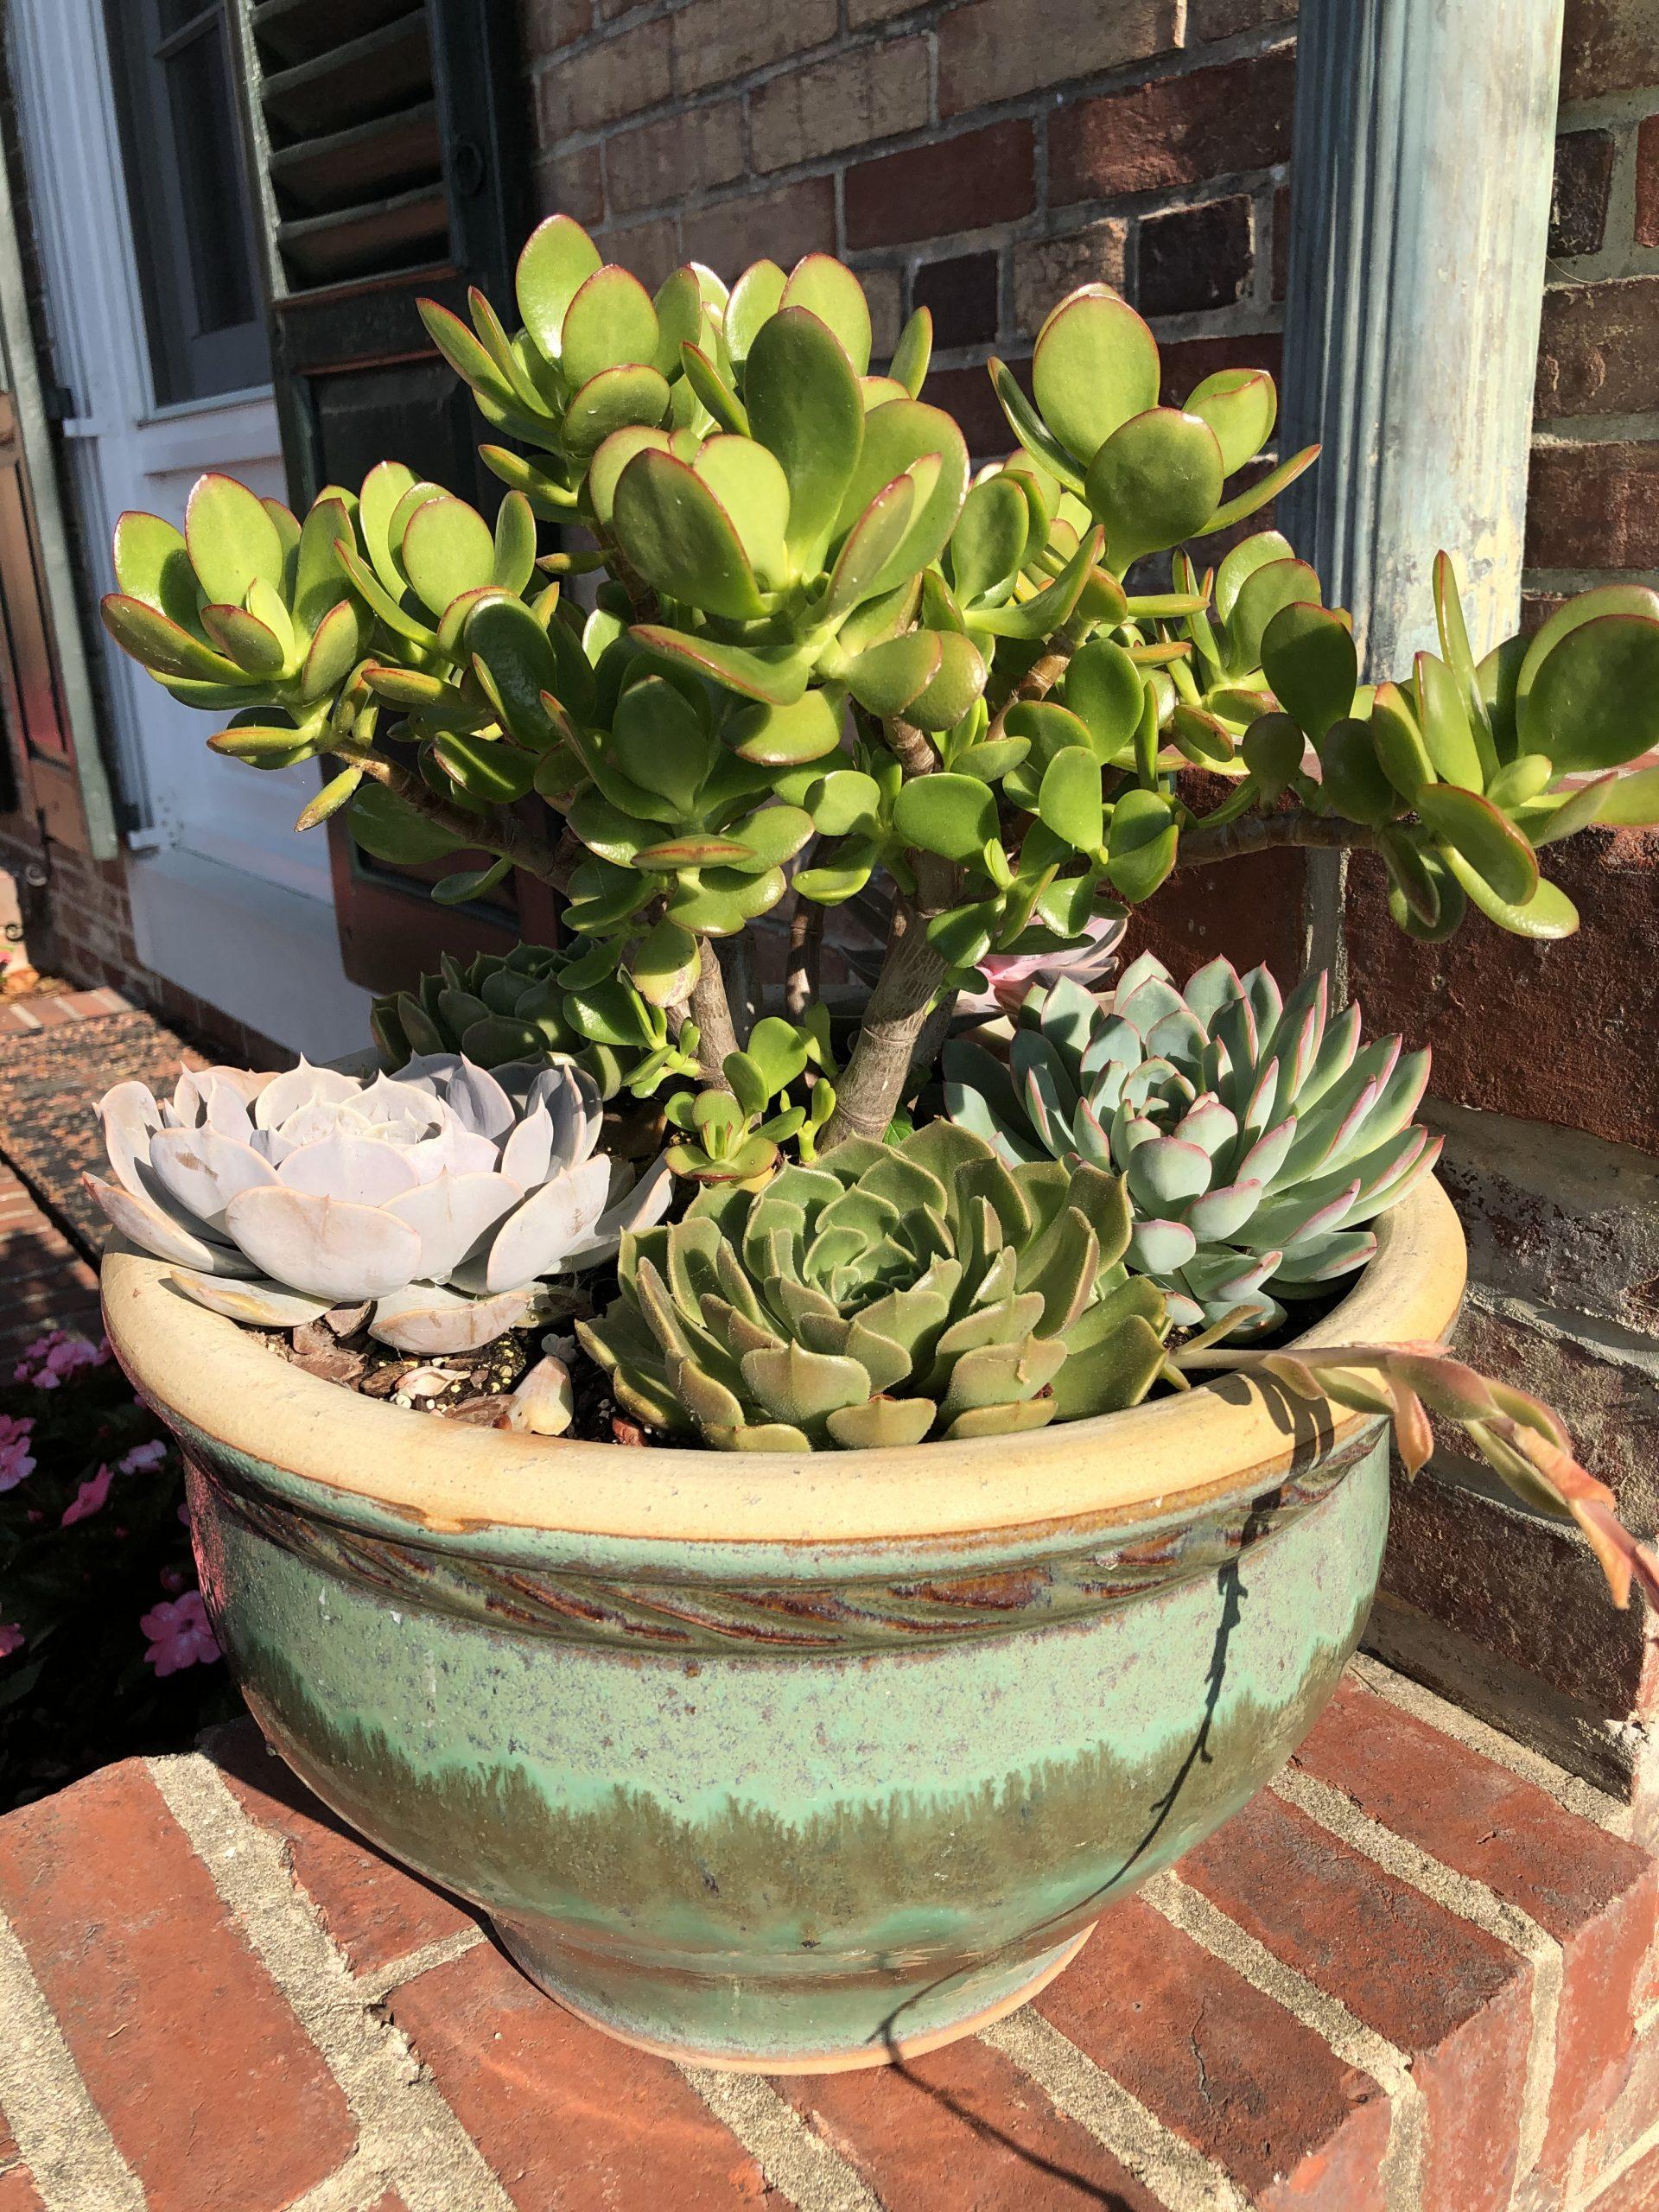 Varied succulents